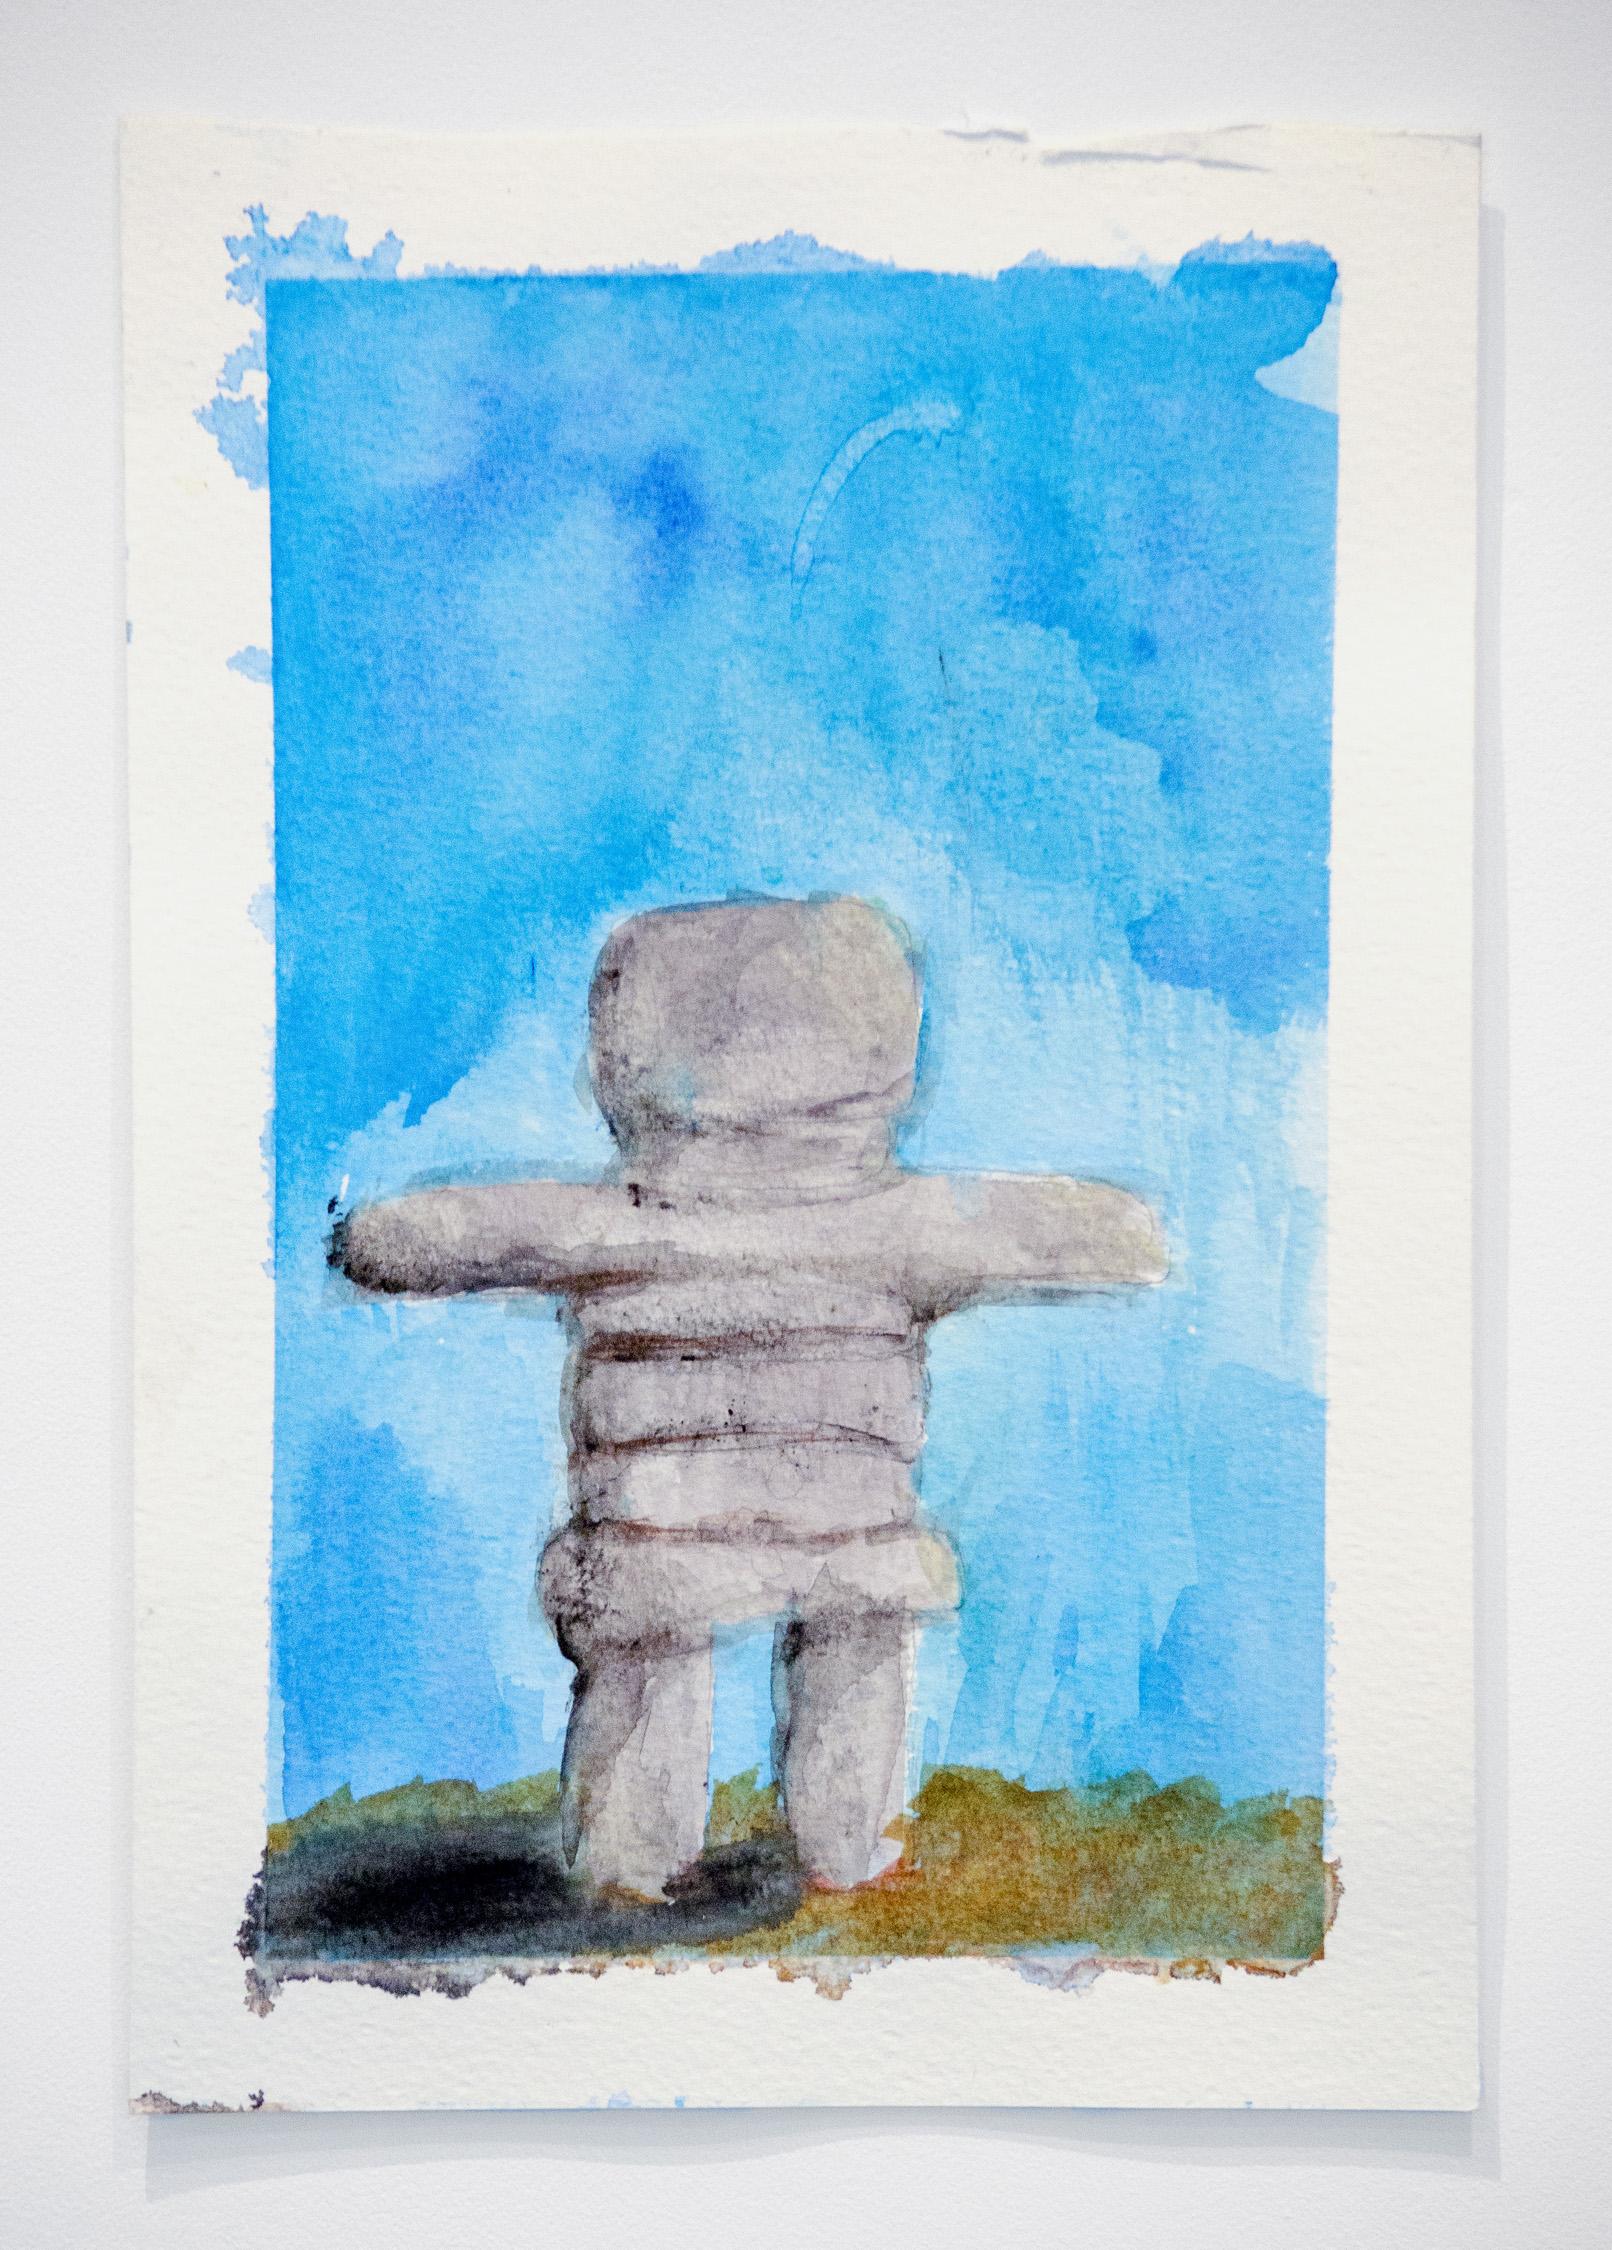 Alexia D'Monte   Rockman,  2019 Watercolor on paper 10.5 x 7 inches (26.5 x 17.5 cm)  Starting bid: $20